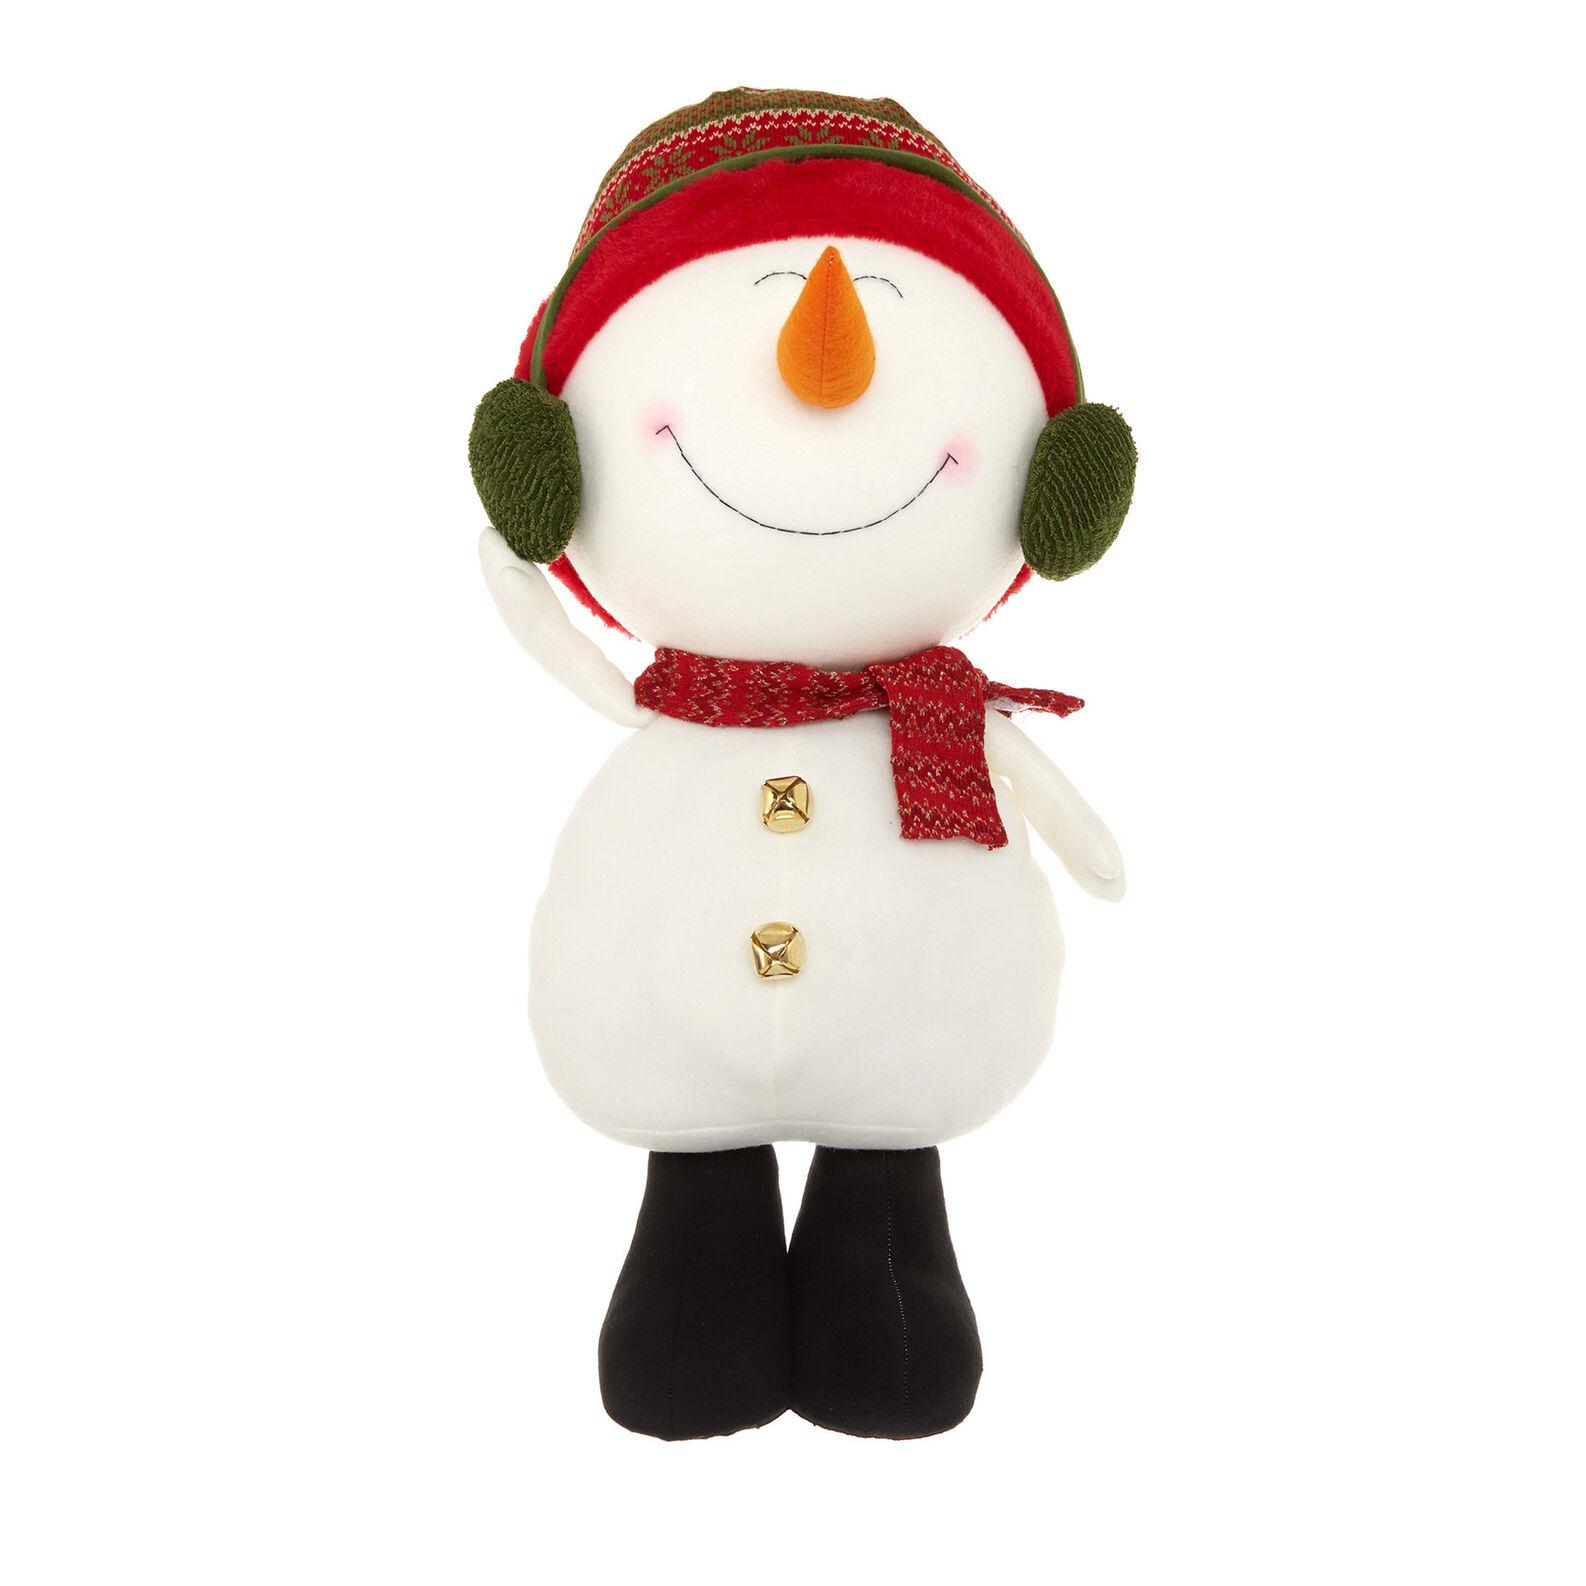 Decorative Christmas soft toy